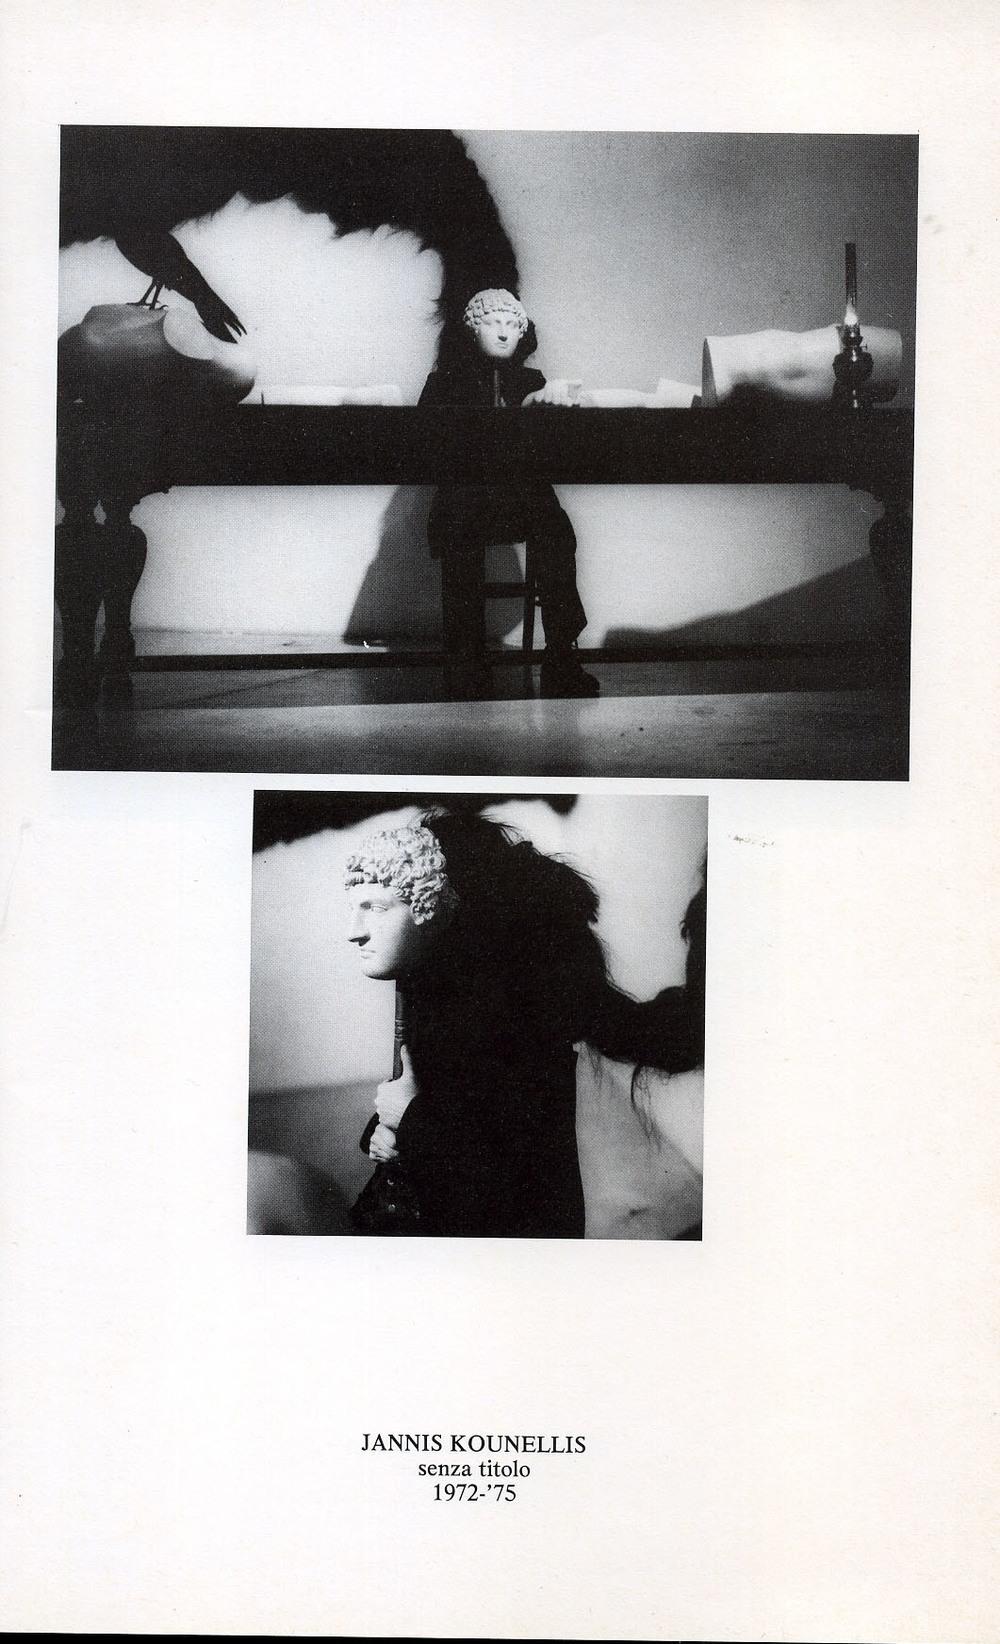 le figure del tempo - Kounellis- Galleria de ' foscherari .jpg